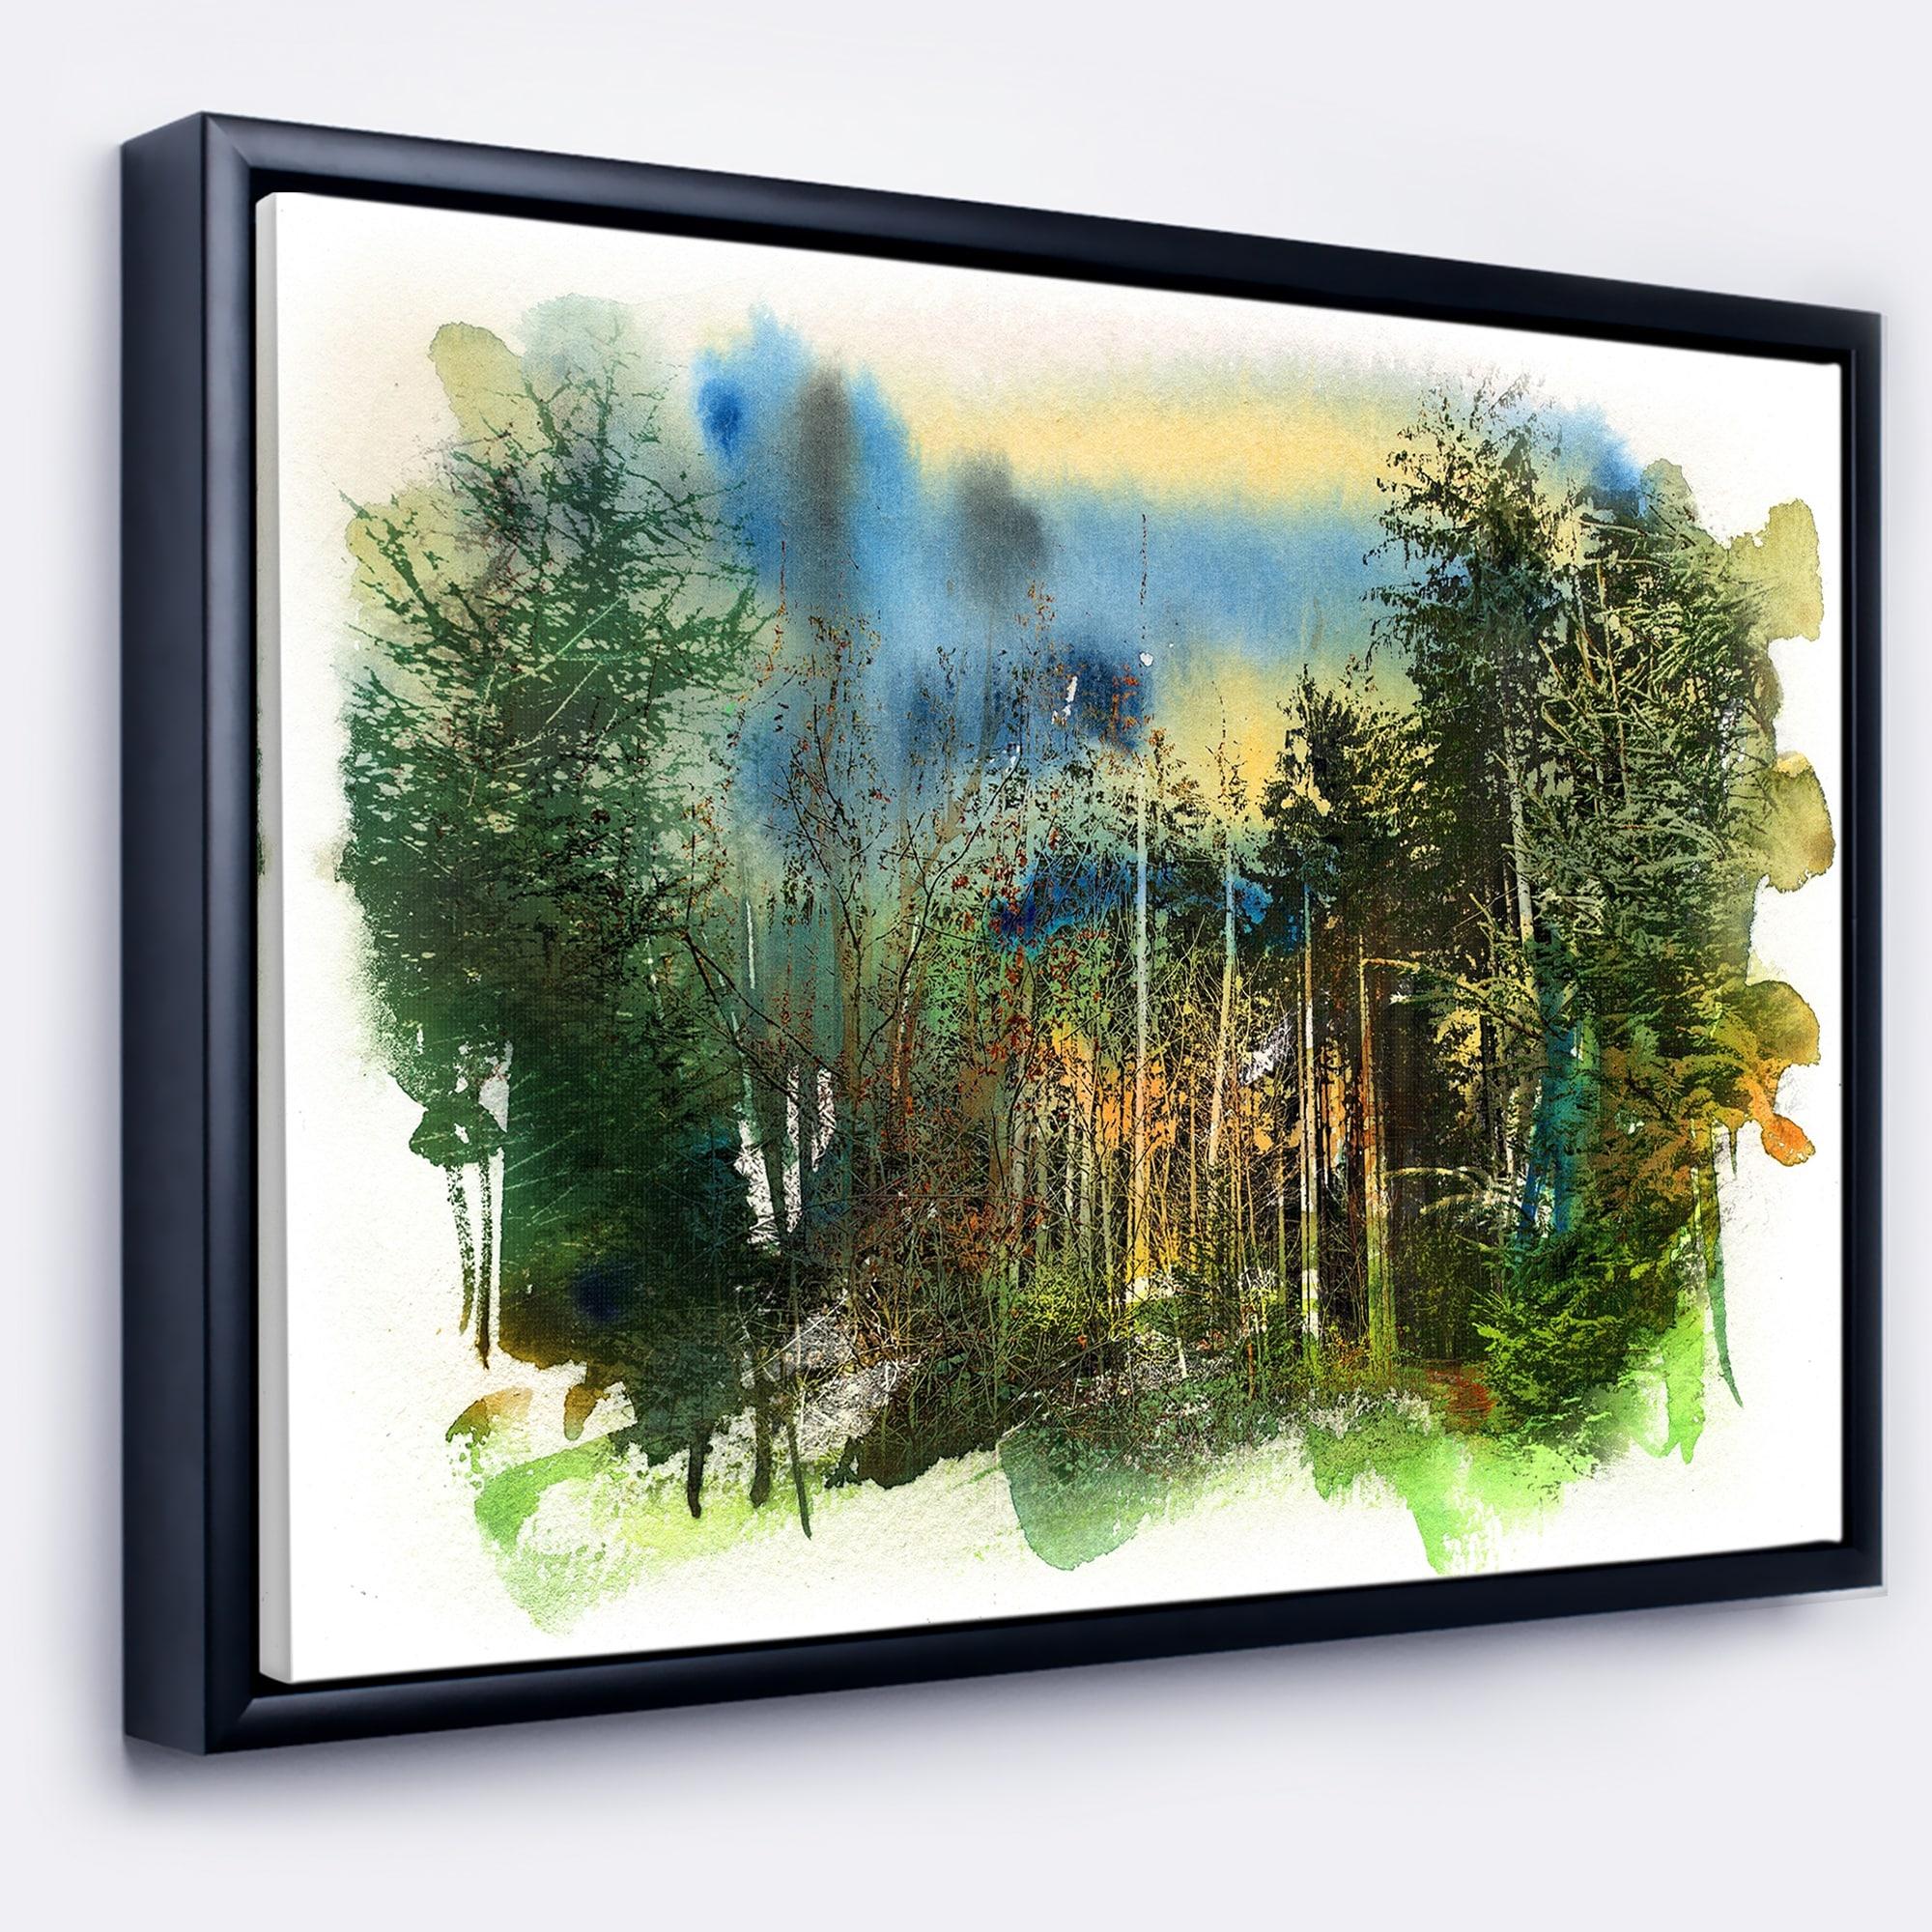 shop designart colorful forest watercolor landscape painting framed canvas print overstock 18953596 designart colorful forest watercolor landscape painting framed canvas print